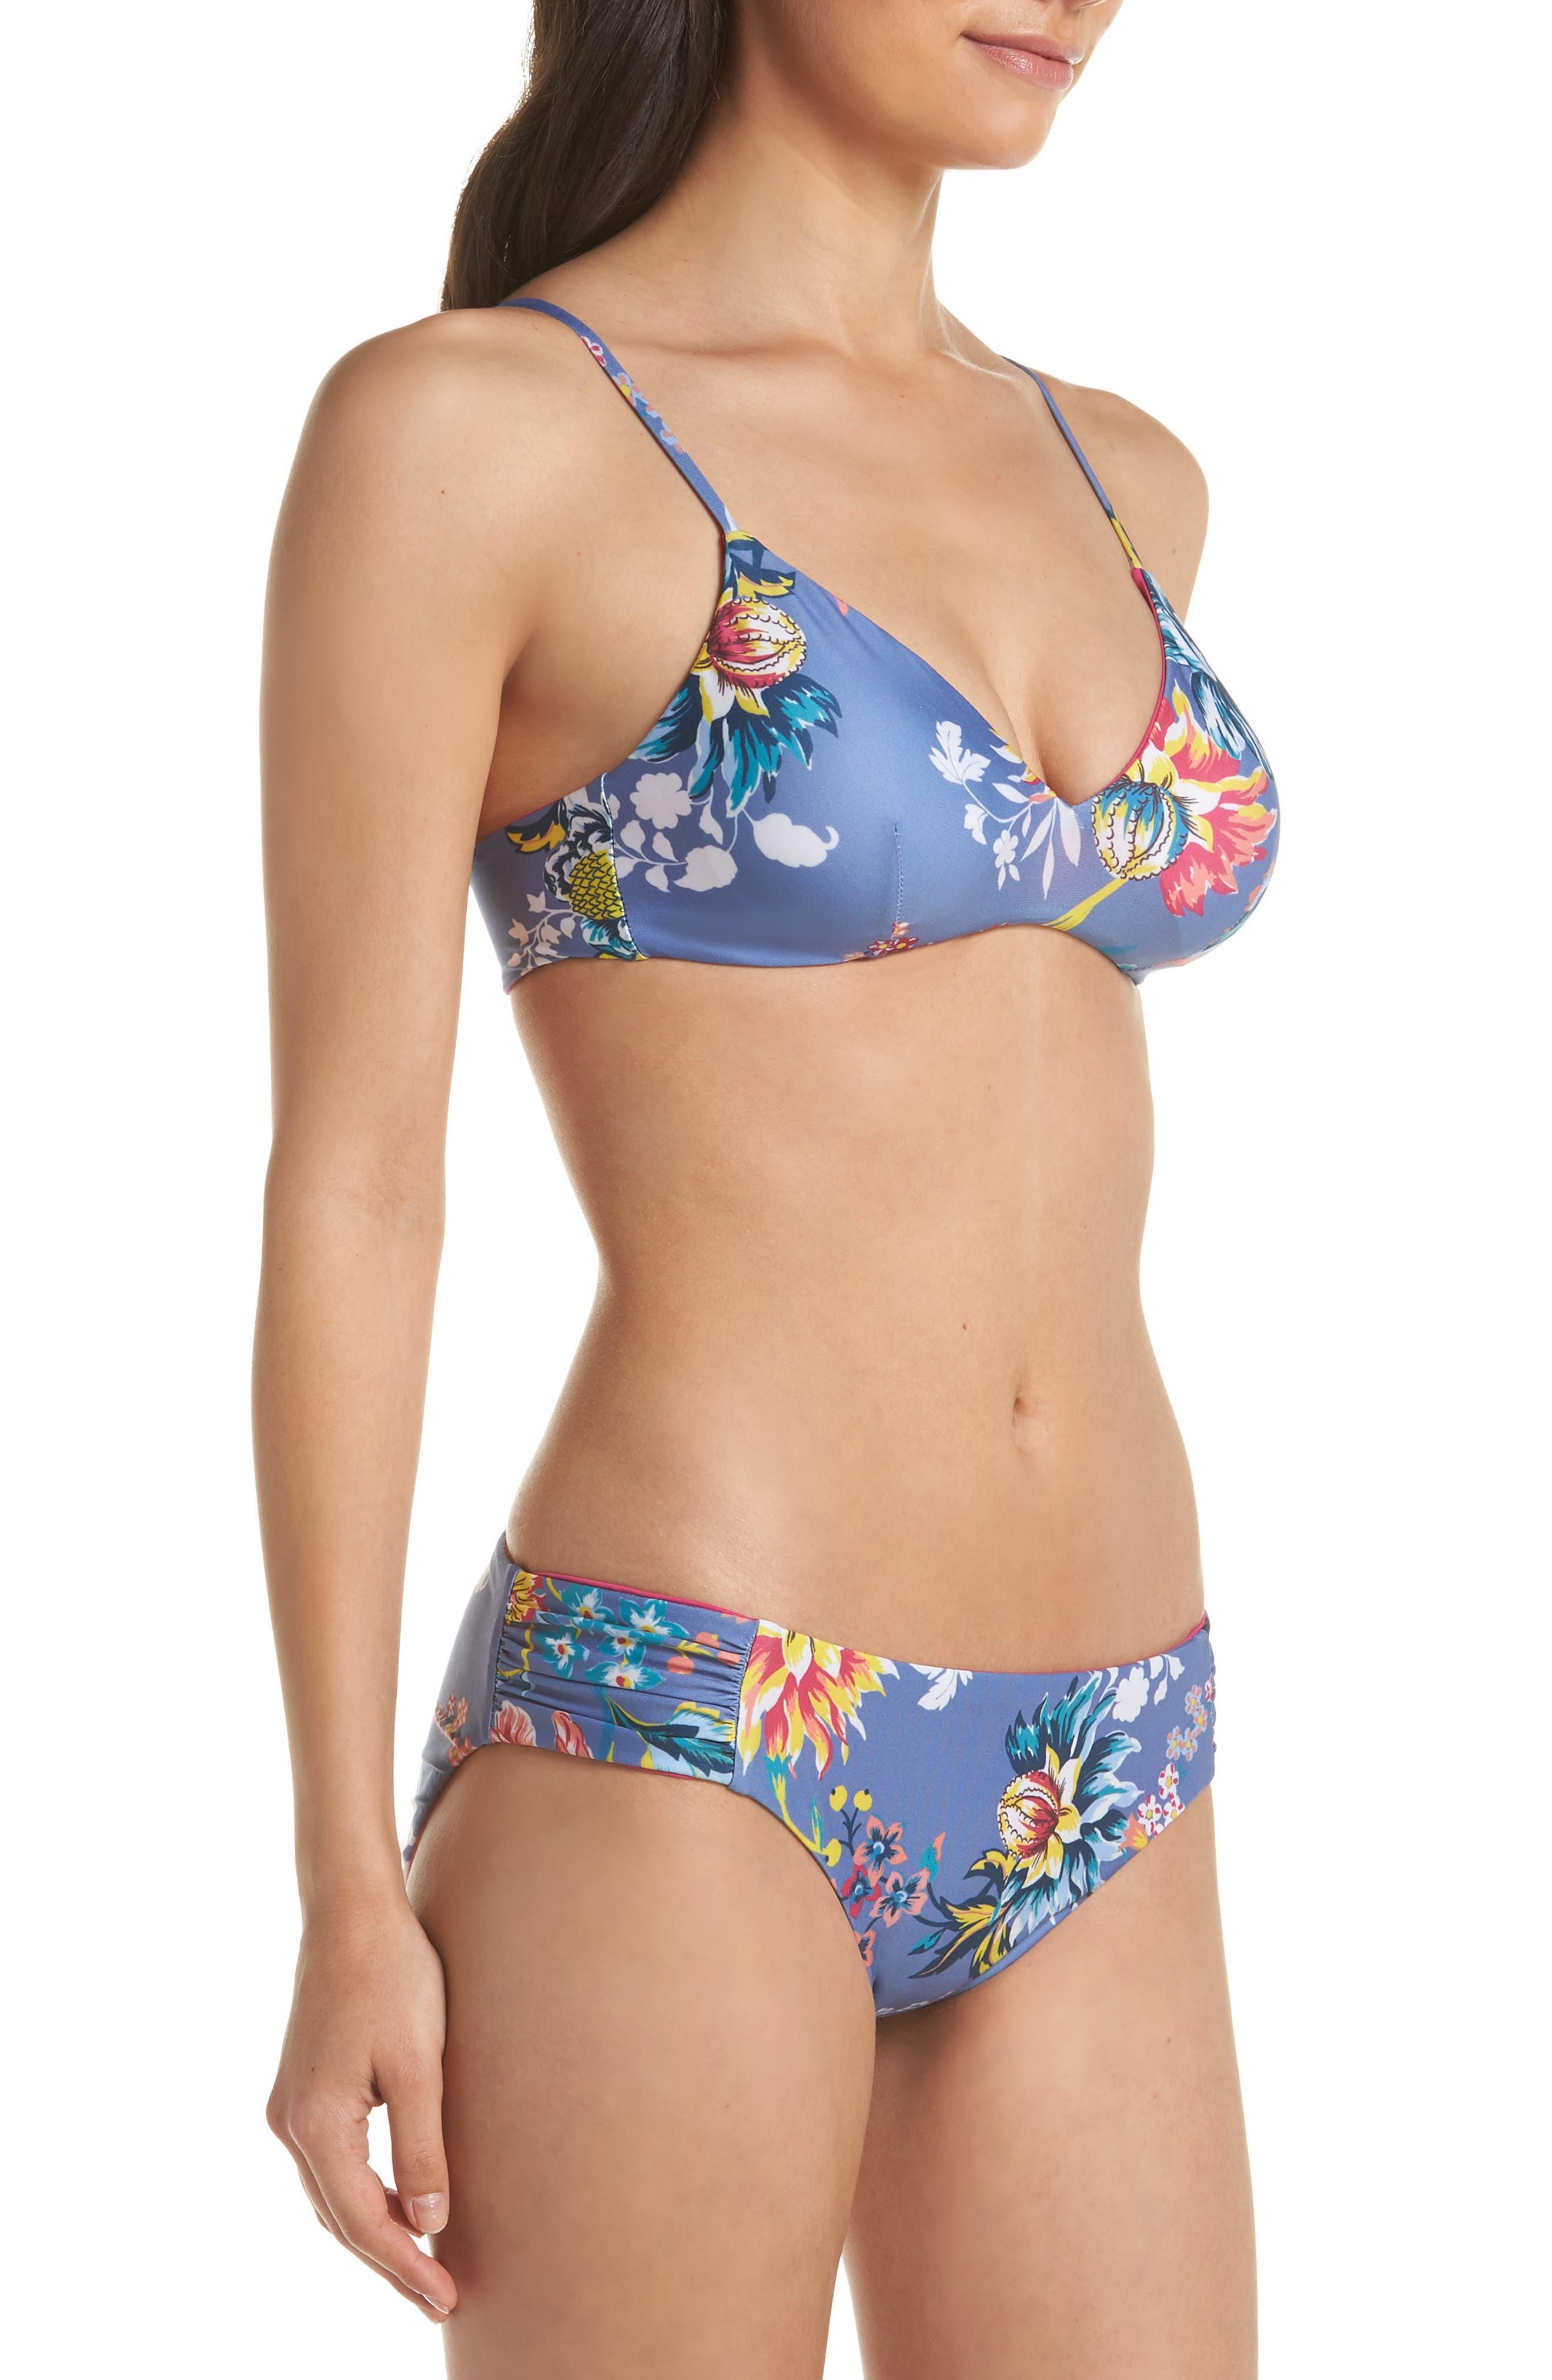 Victoria Garden Reversible Bikini Bottoms,                             Alternate thumbnail 8, color,                             Purple/ Blue Multi